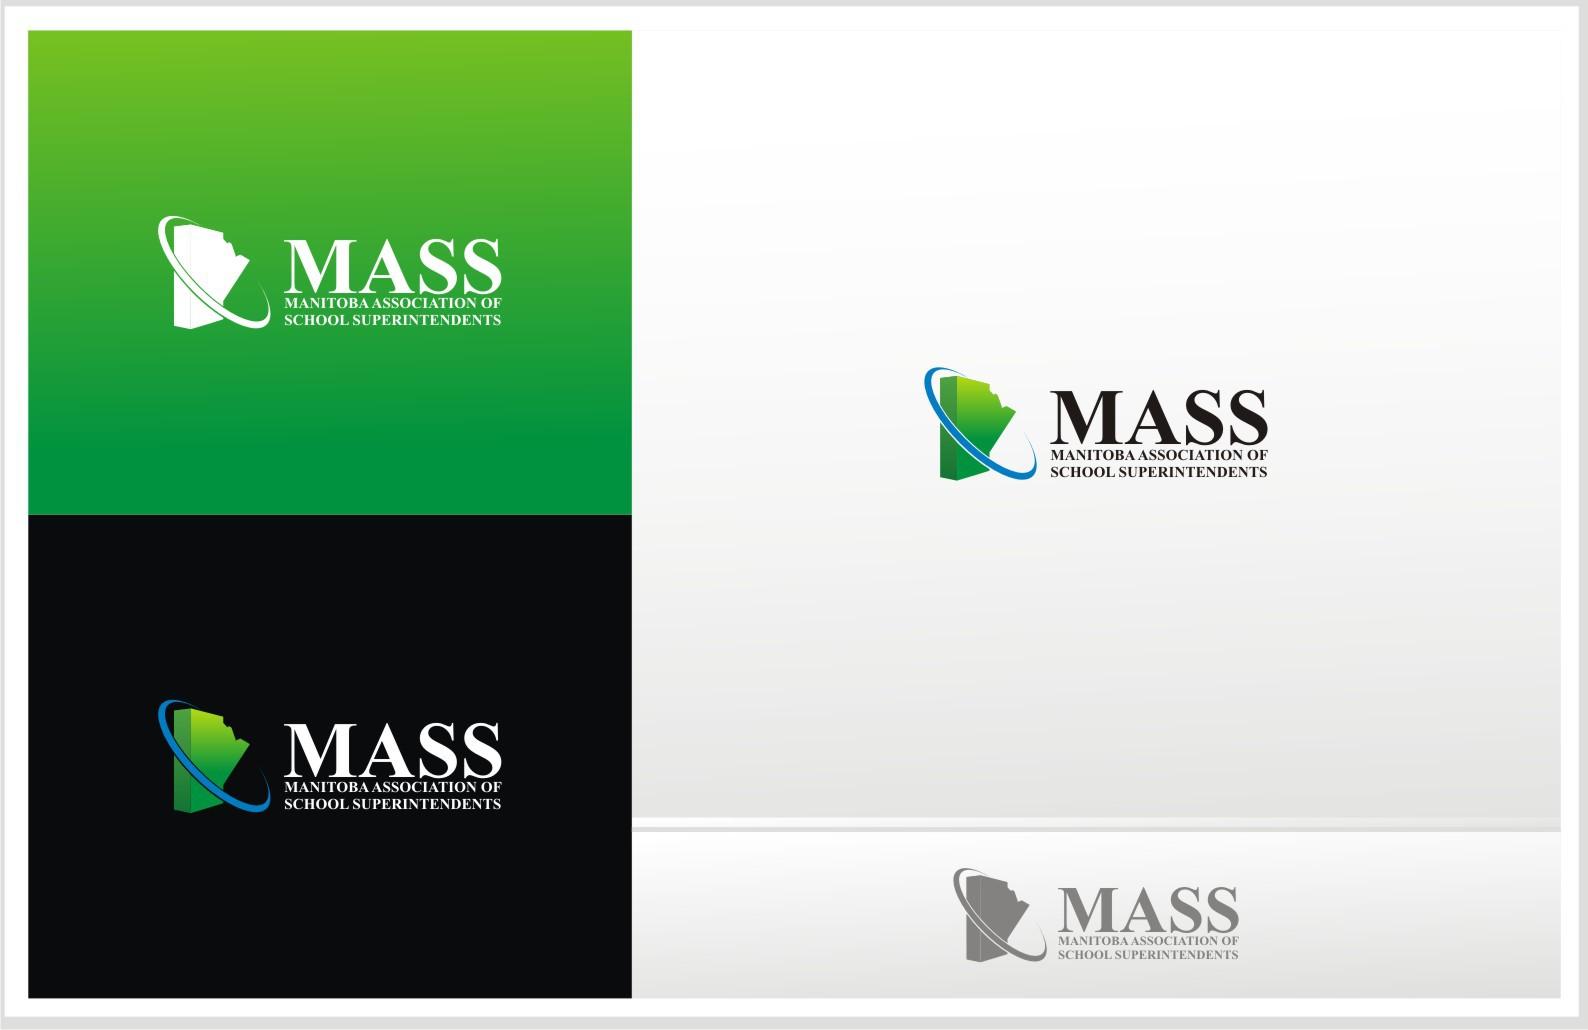 logo for Manitoba Association of School Superintendents